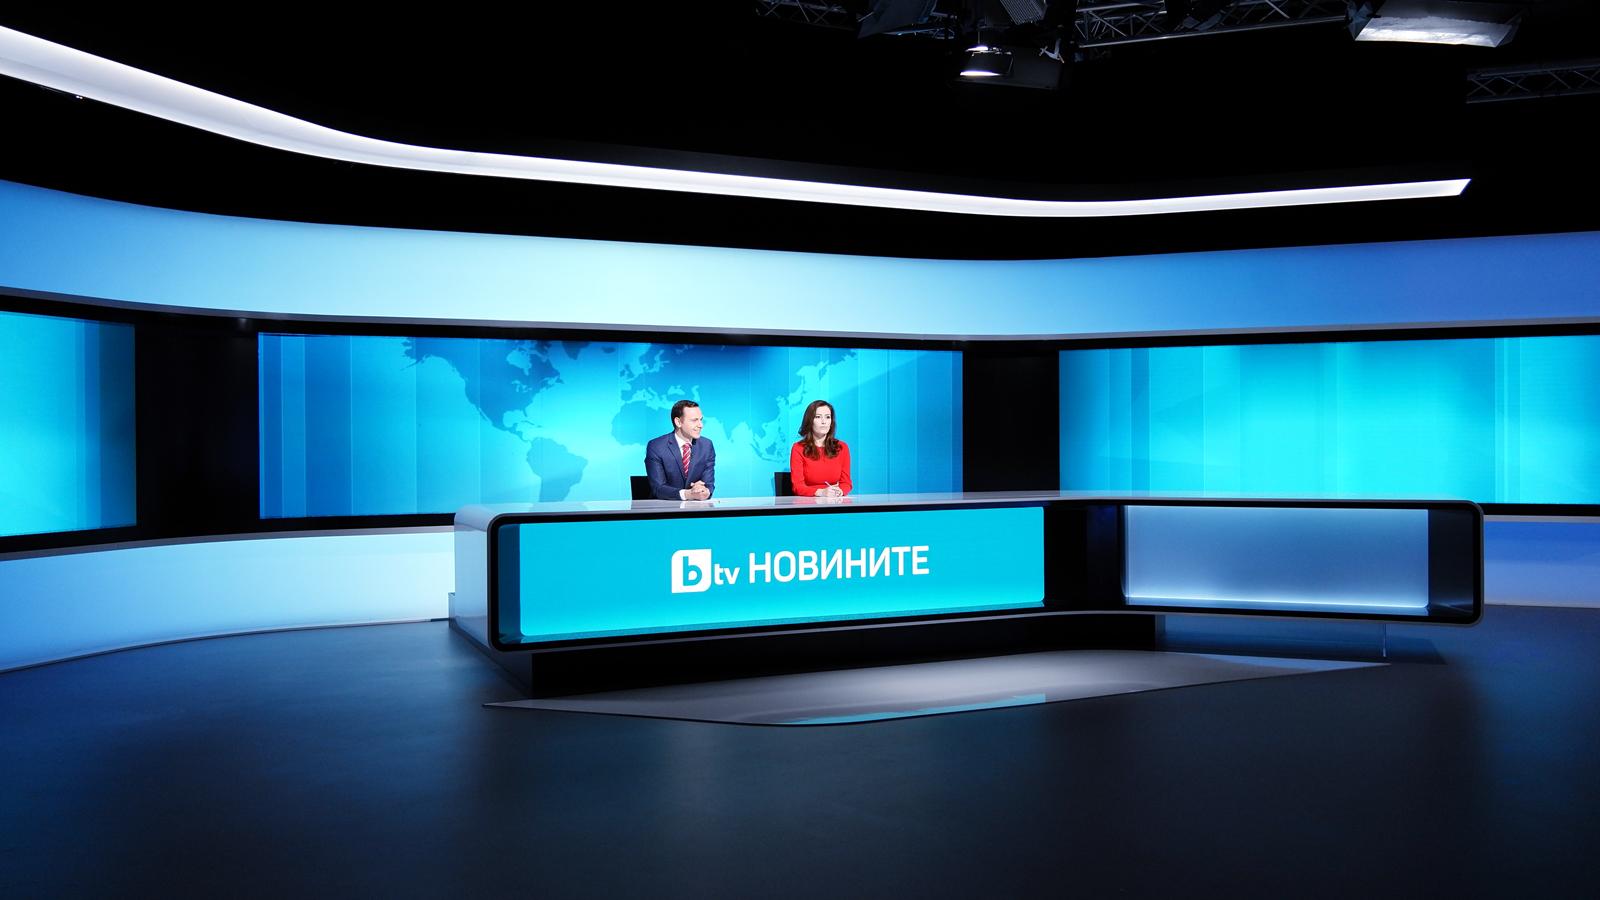 NCS_BTV-Studio-Bulgaria_0003